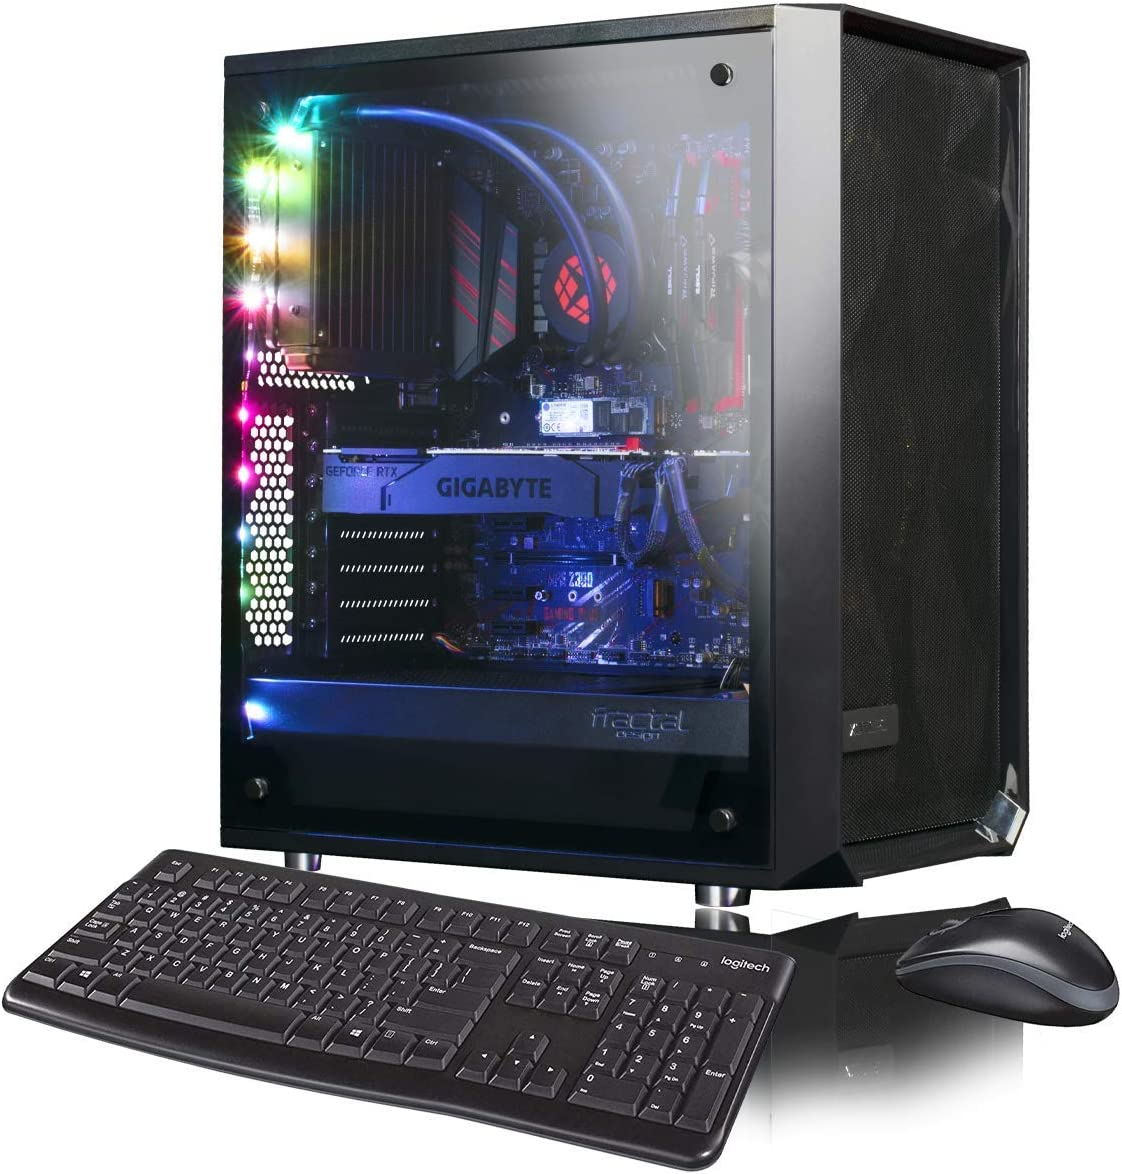 XOTIC Meshify C Extreme (Intel 9th Gen i9-9900K 8-core 5.0GHz Turbo, 16GB DDR4 RAM, 500GB NVMe SSD + 2TB HDD, RTX 2070 Super 8GB, Windows 10) Liquid Cooled VR Ready Gaming Desktop PC